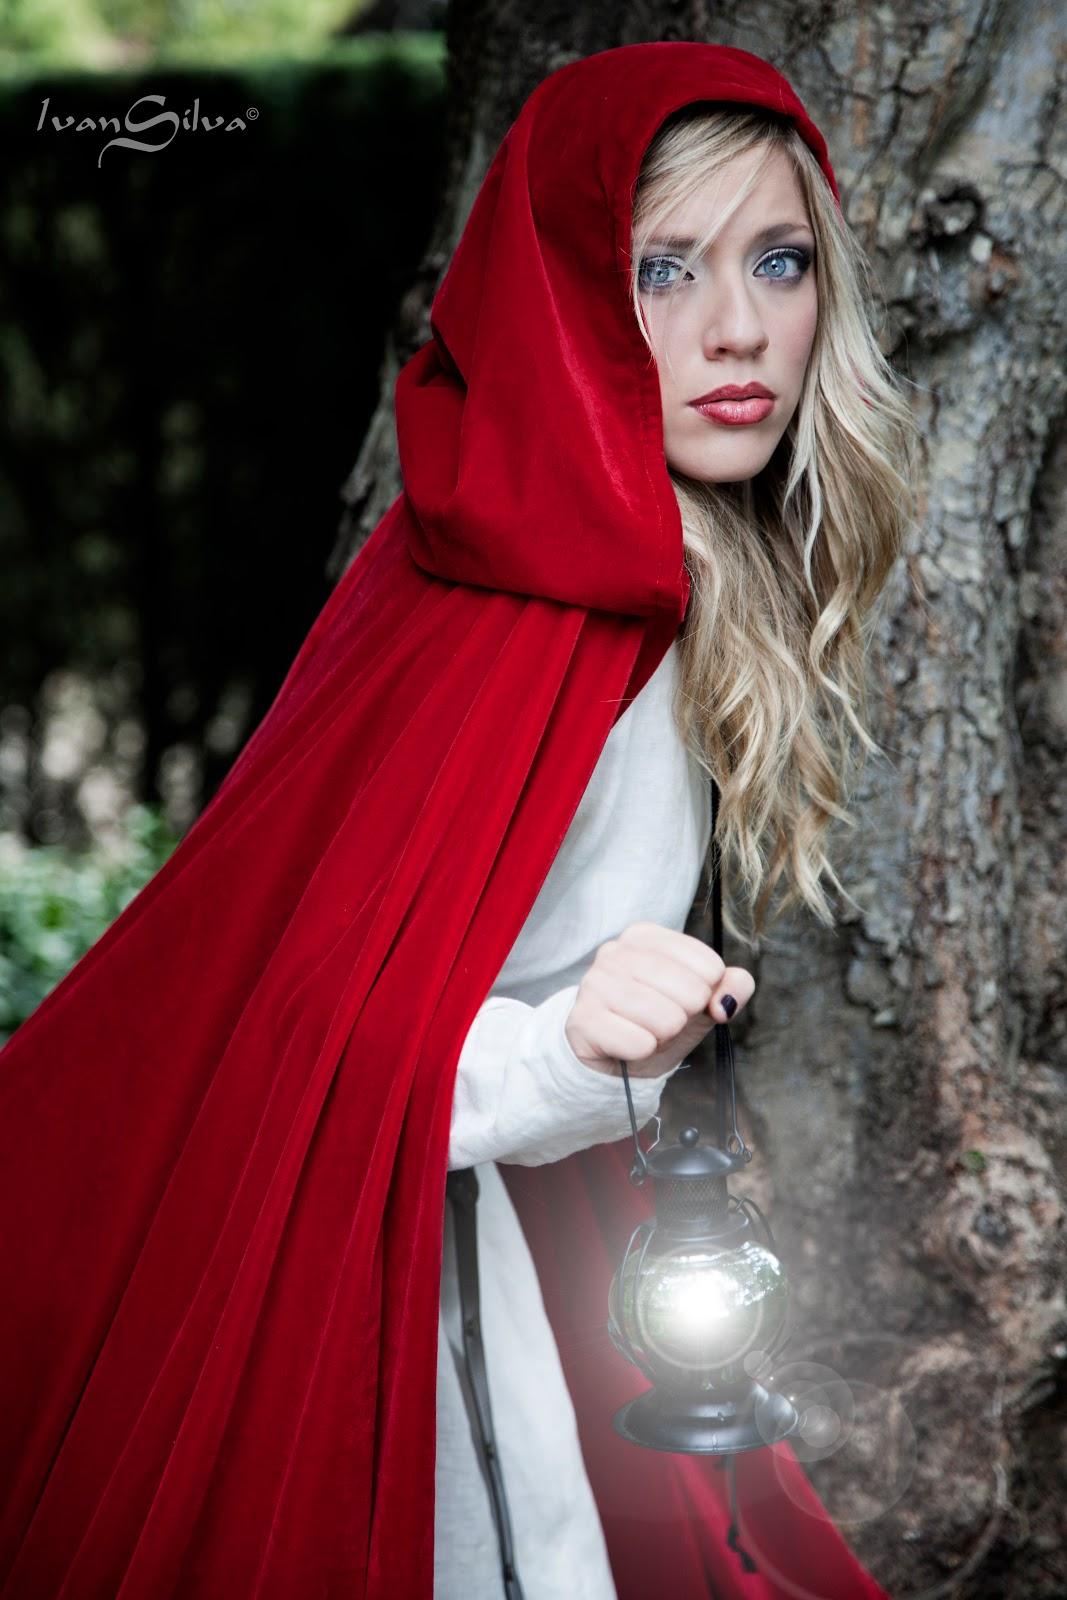 Hot Little Red Riding Hood Little Red Riding Hood Sexy